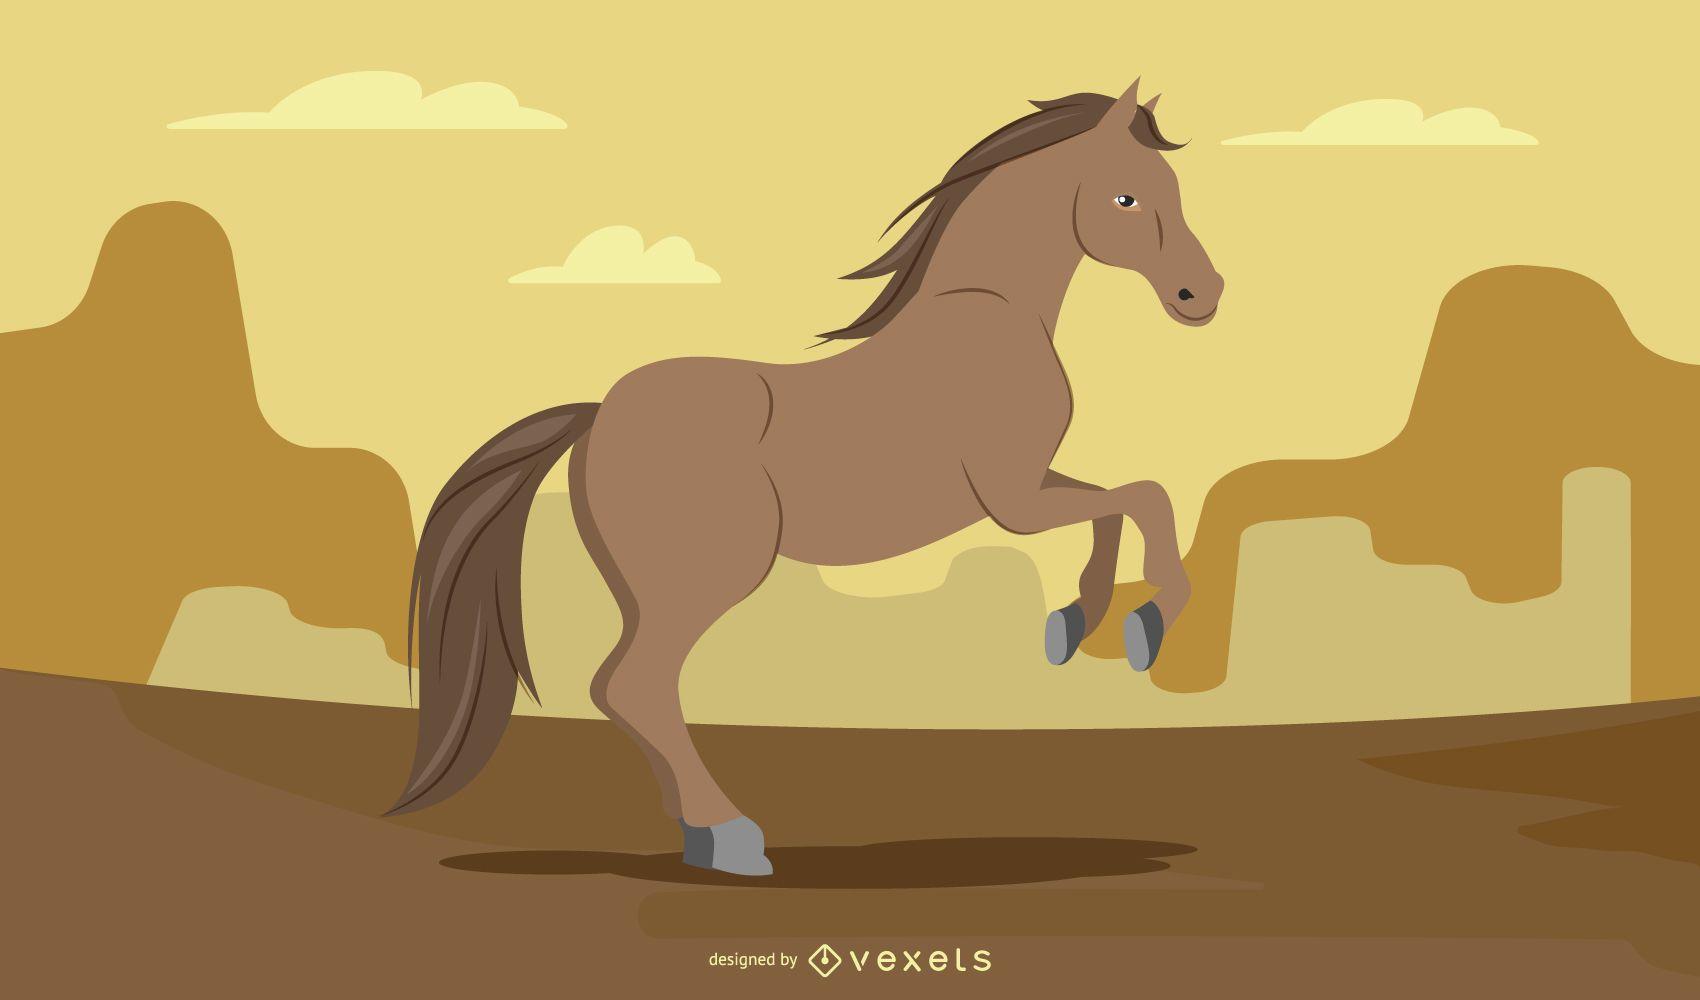 Ilustraci?n de caballo marr?n de crianza